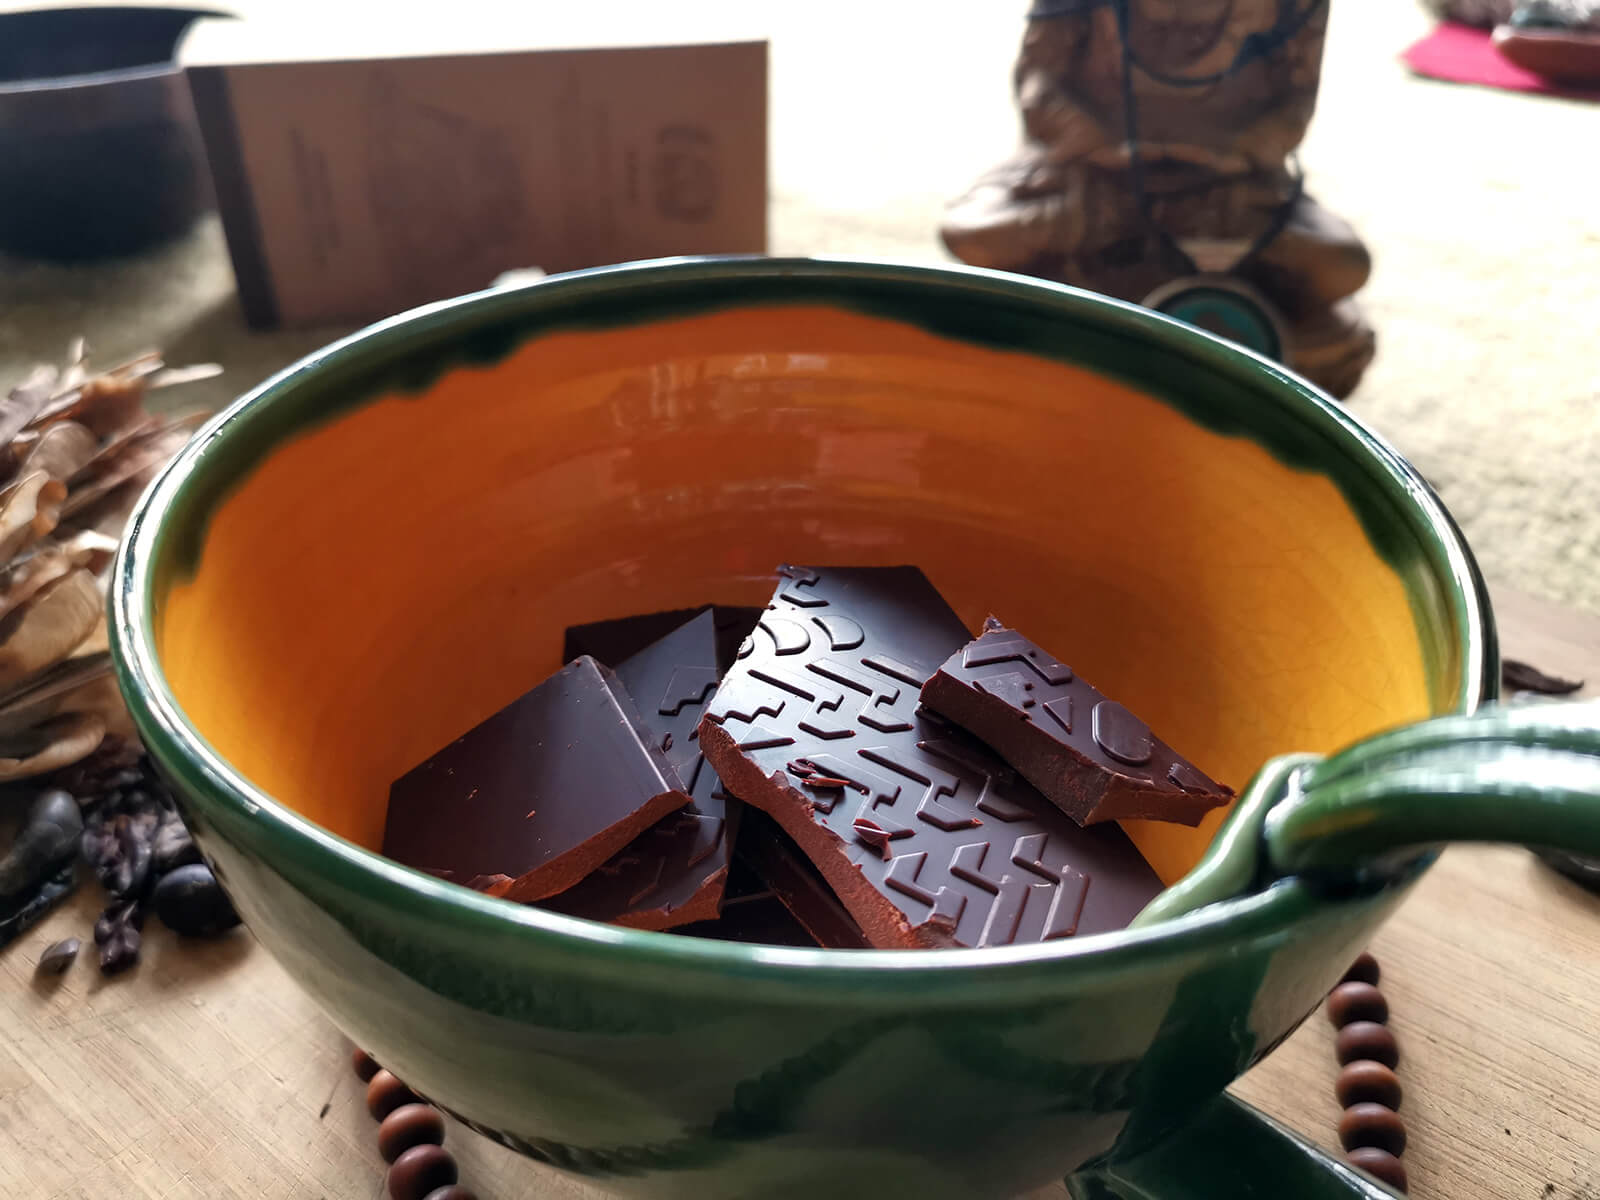 Fair trade ceremoniális csokoládé